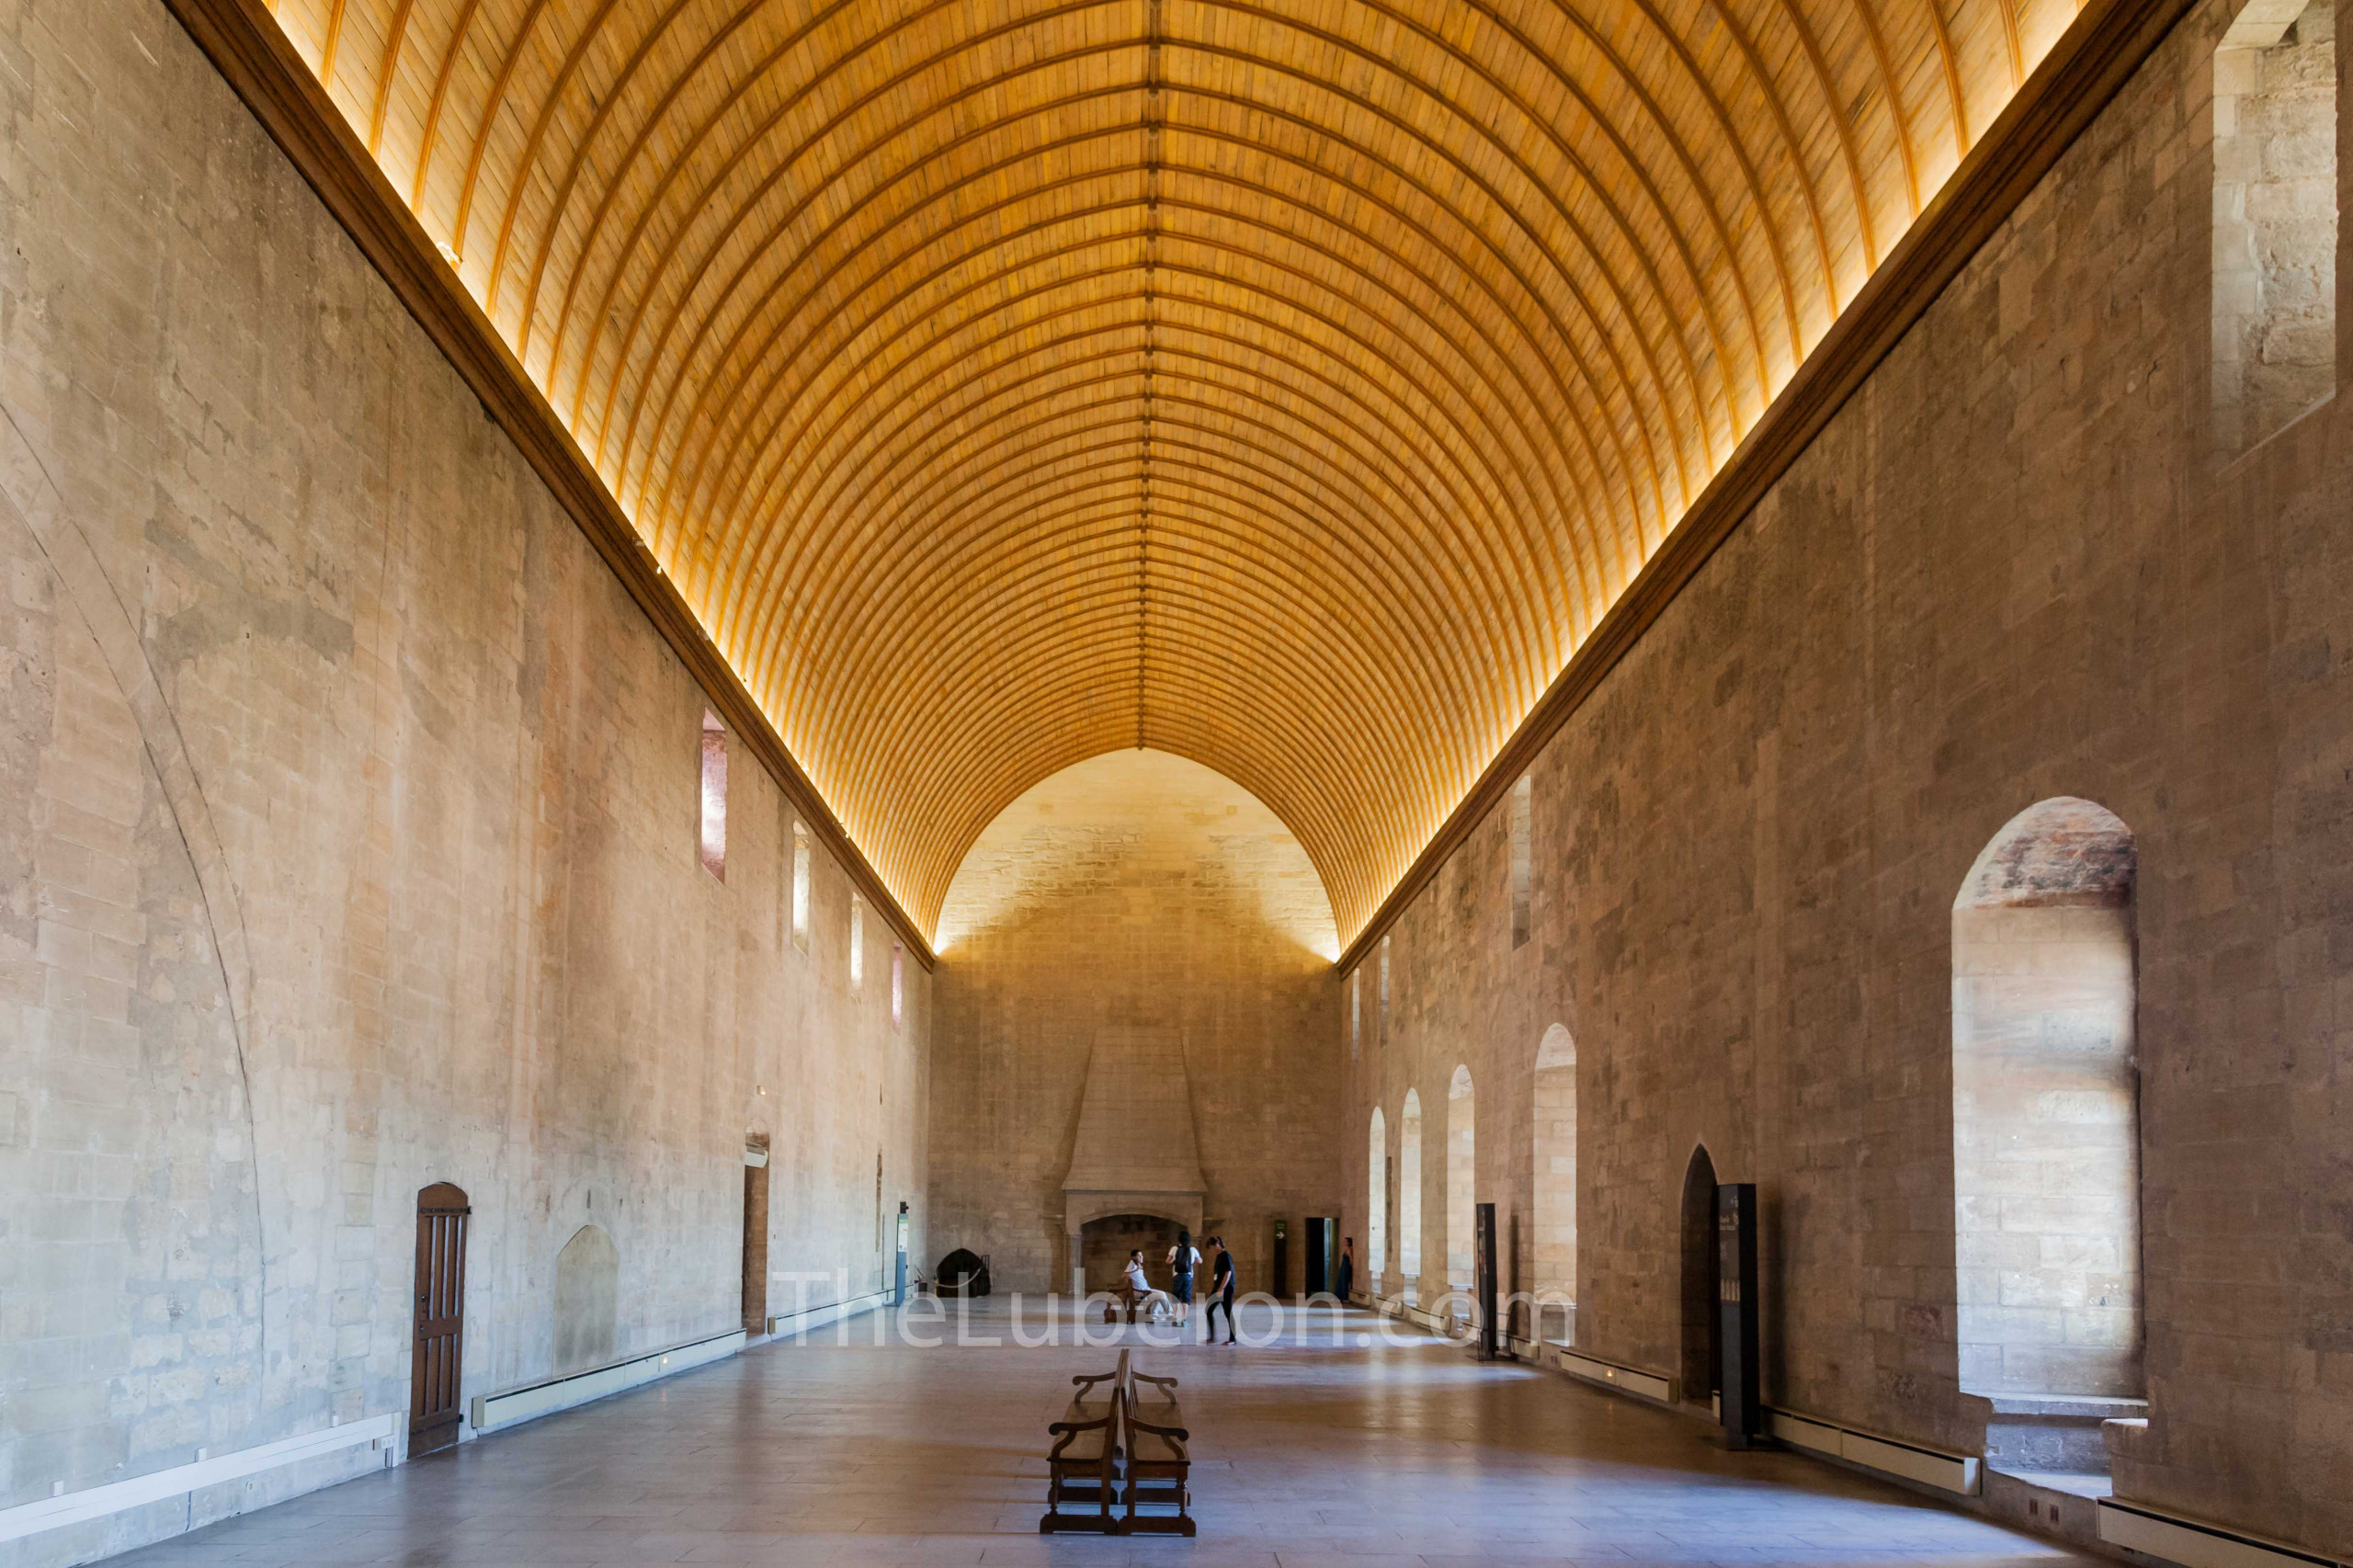 Vast interior of Popes' Palace